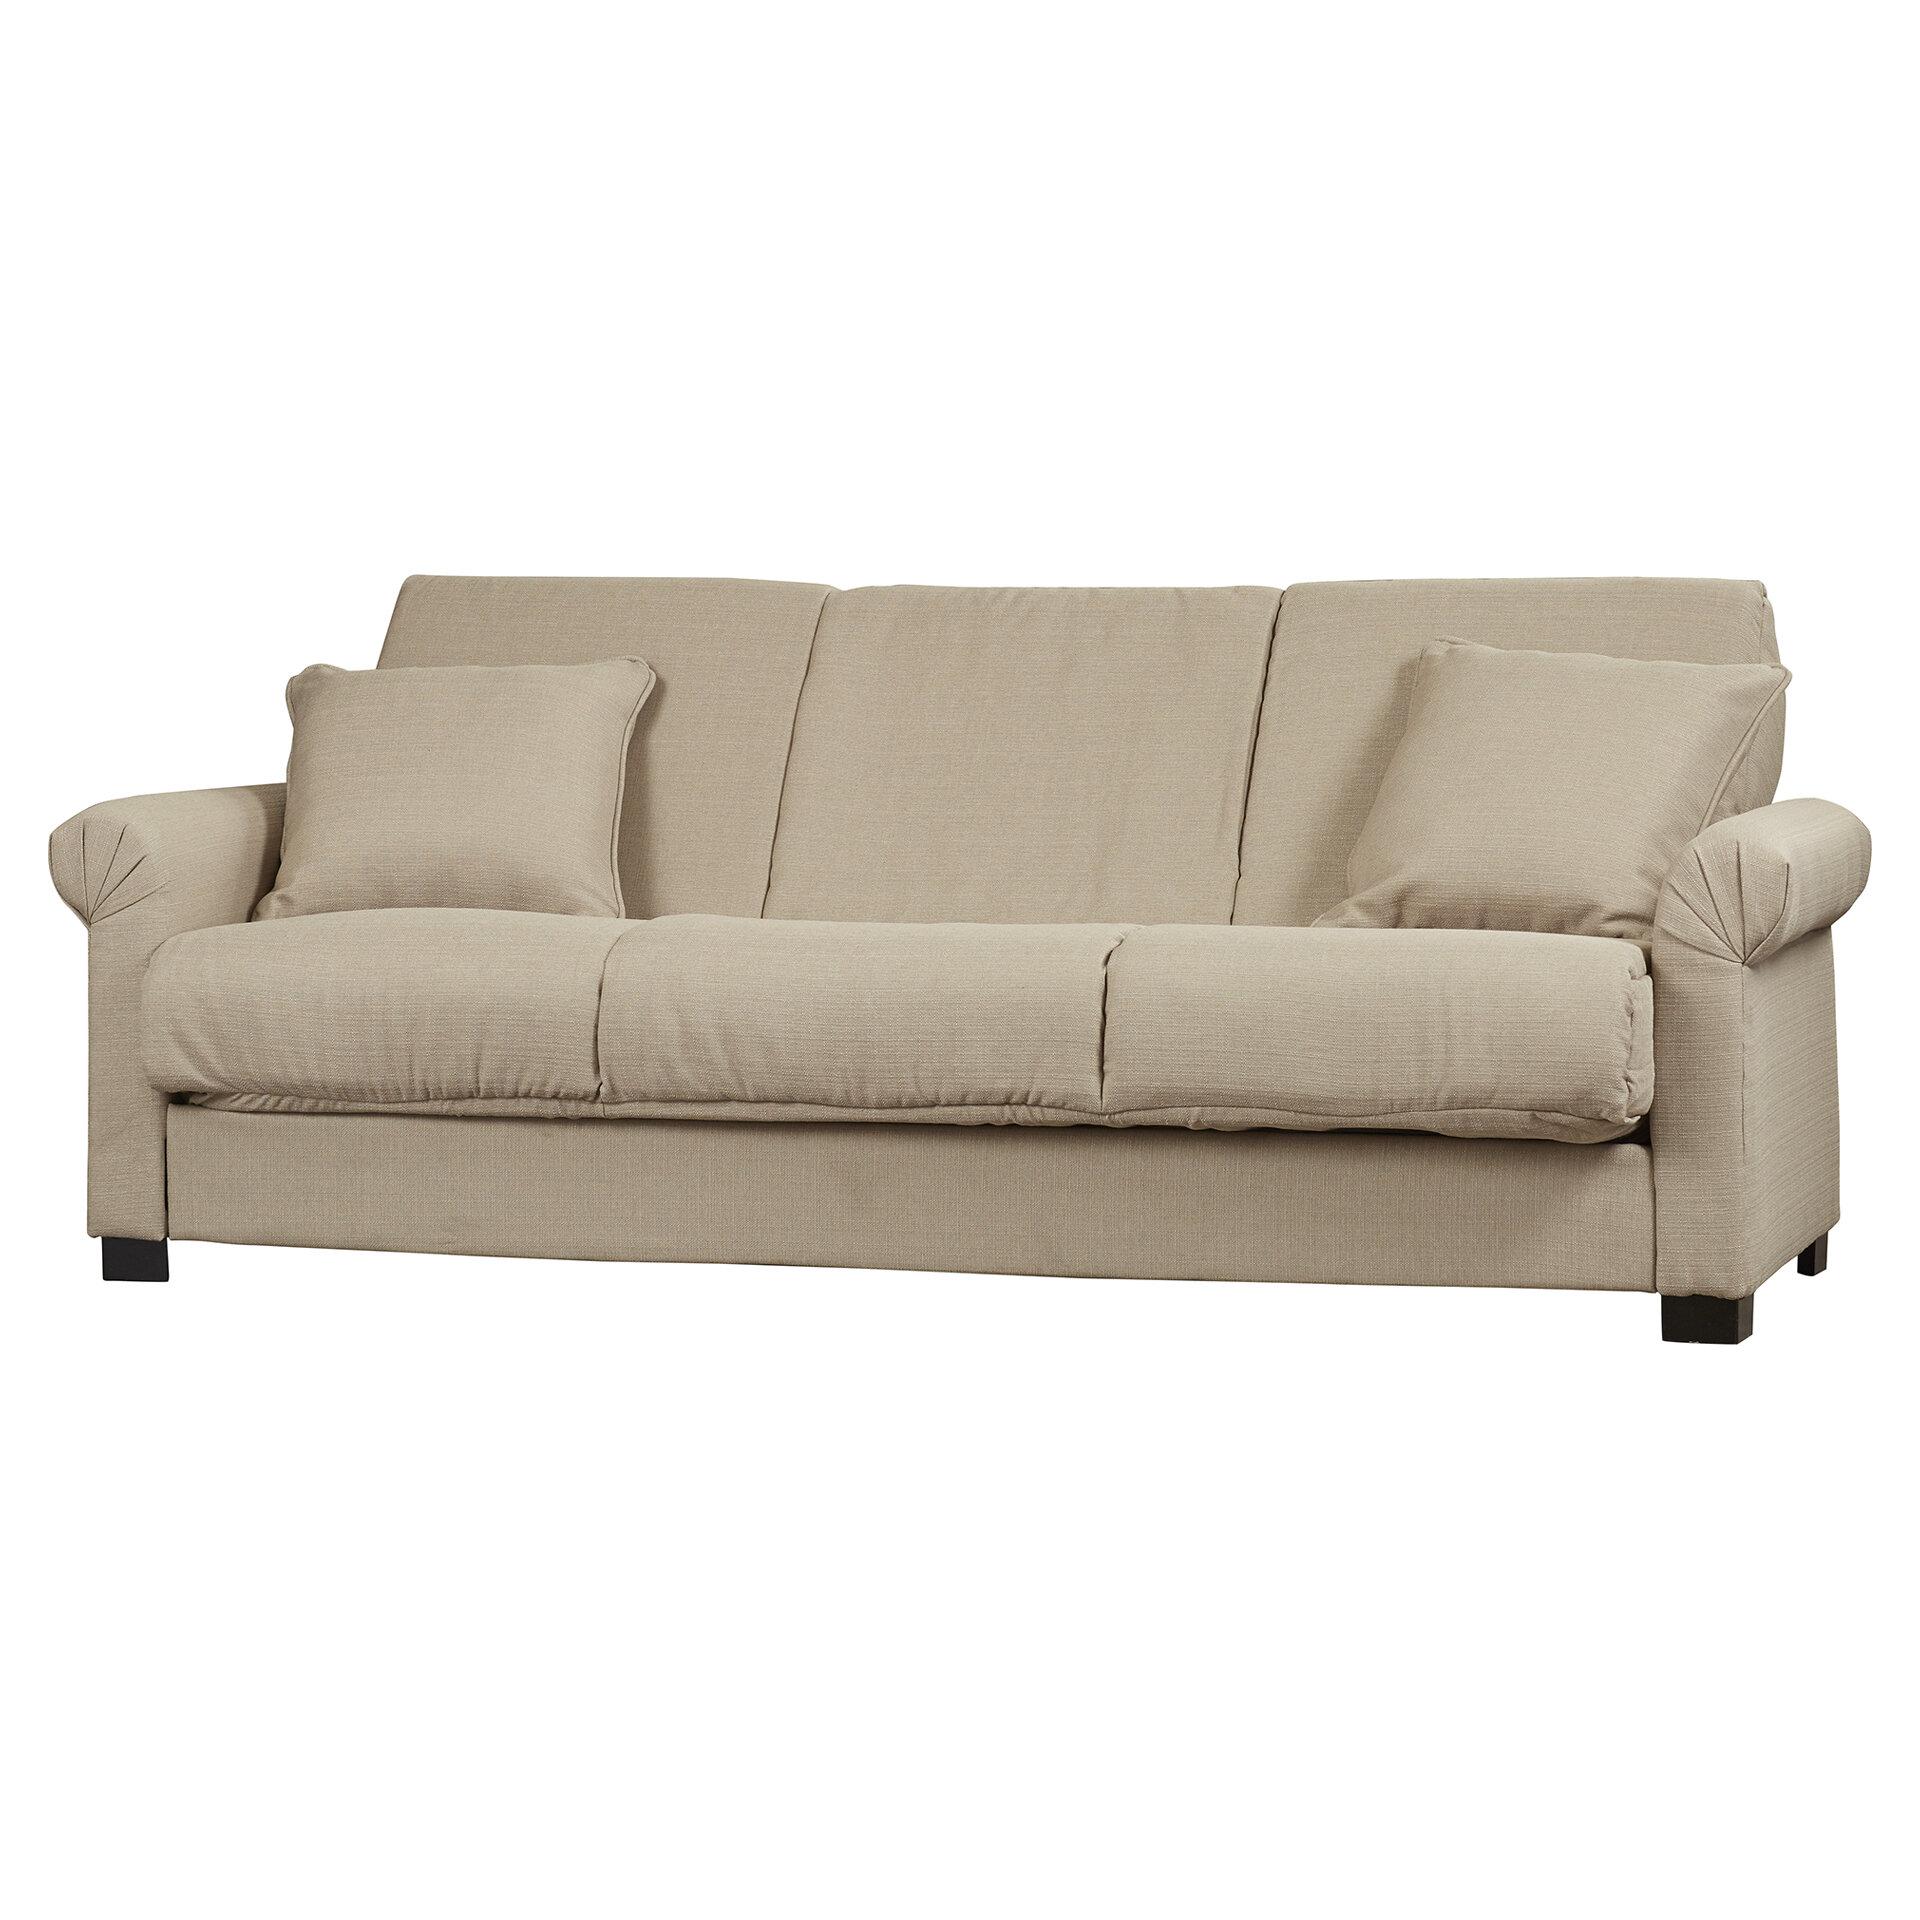 storage in size of sofas elita with walmart unique sleeper hidden sofa beige twin convertible